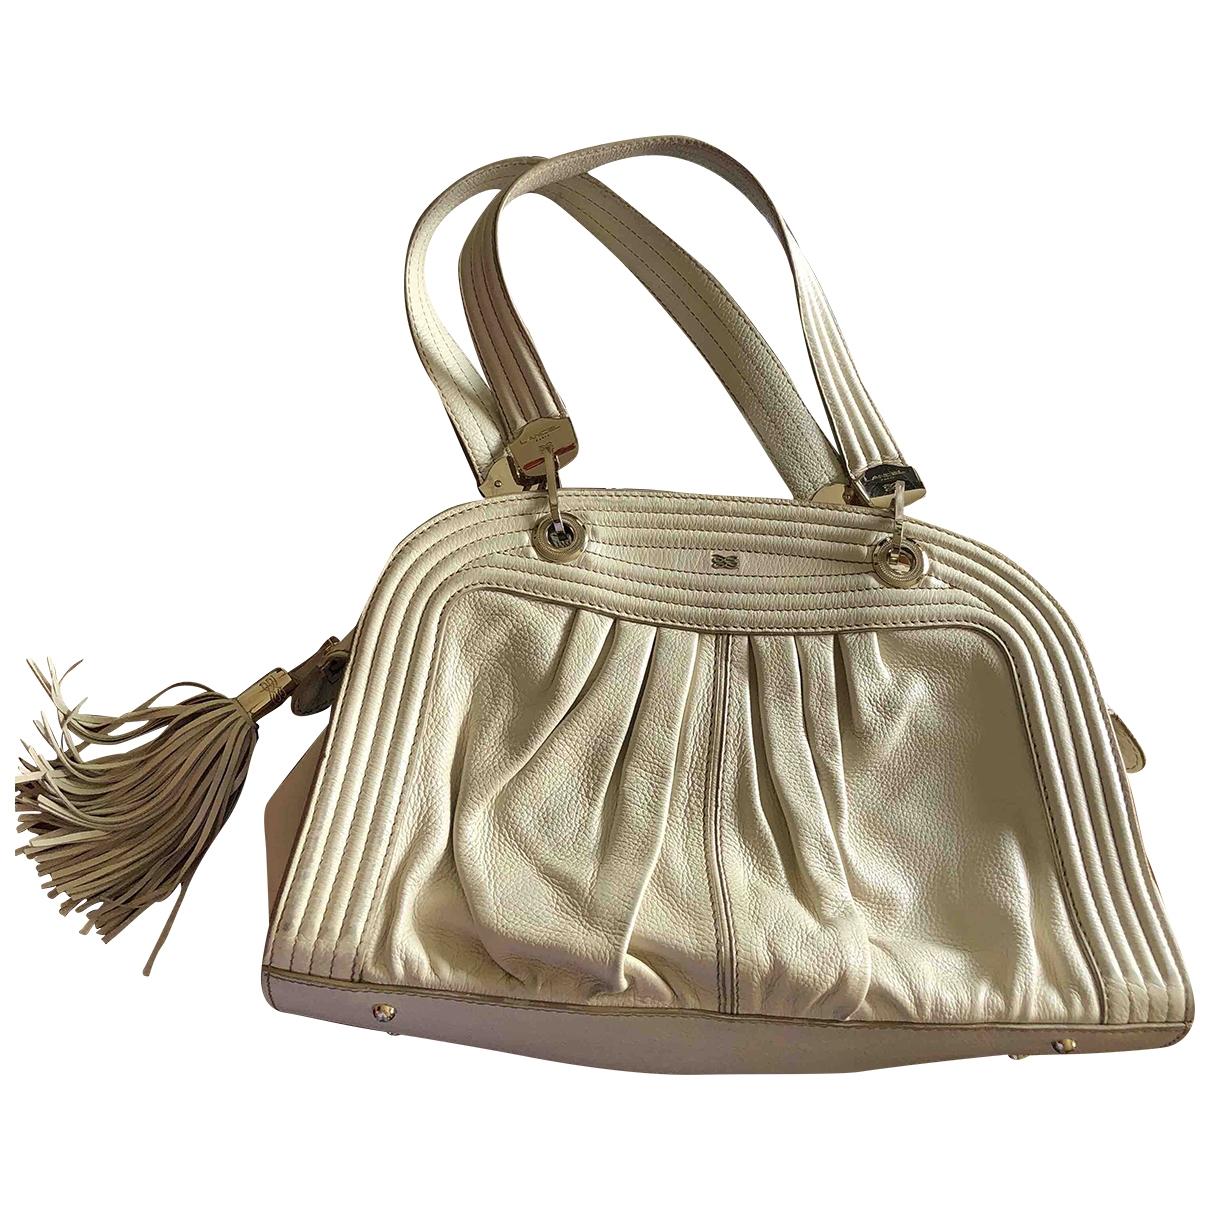 Lancel \N Handtasche in  Beige Leder